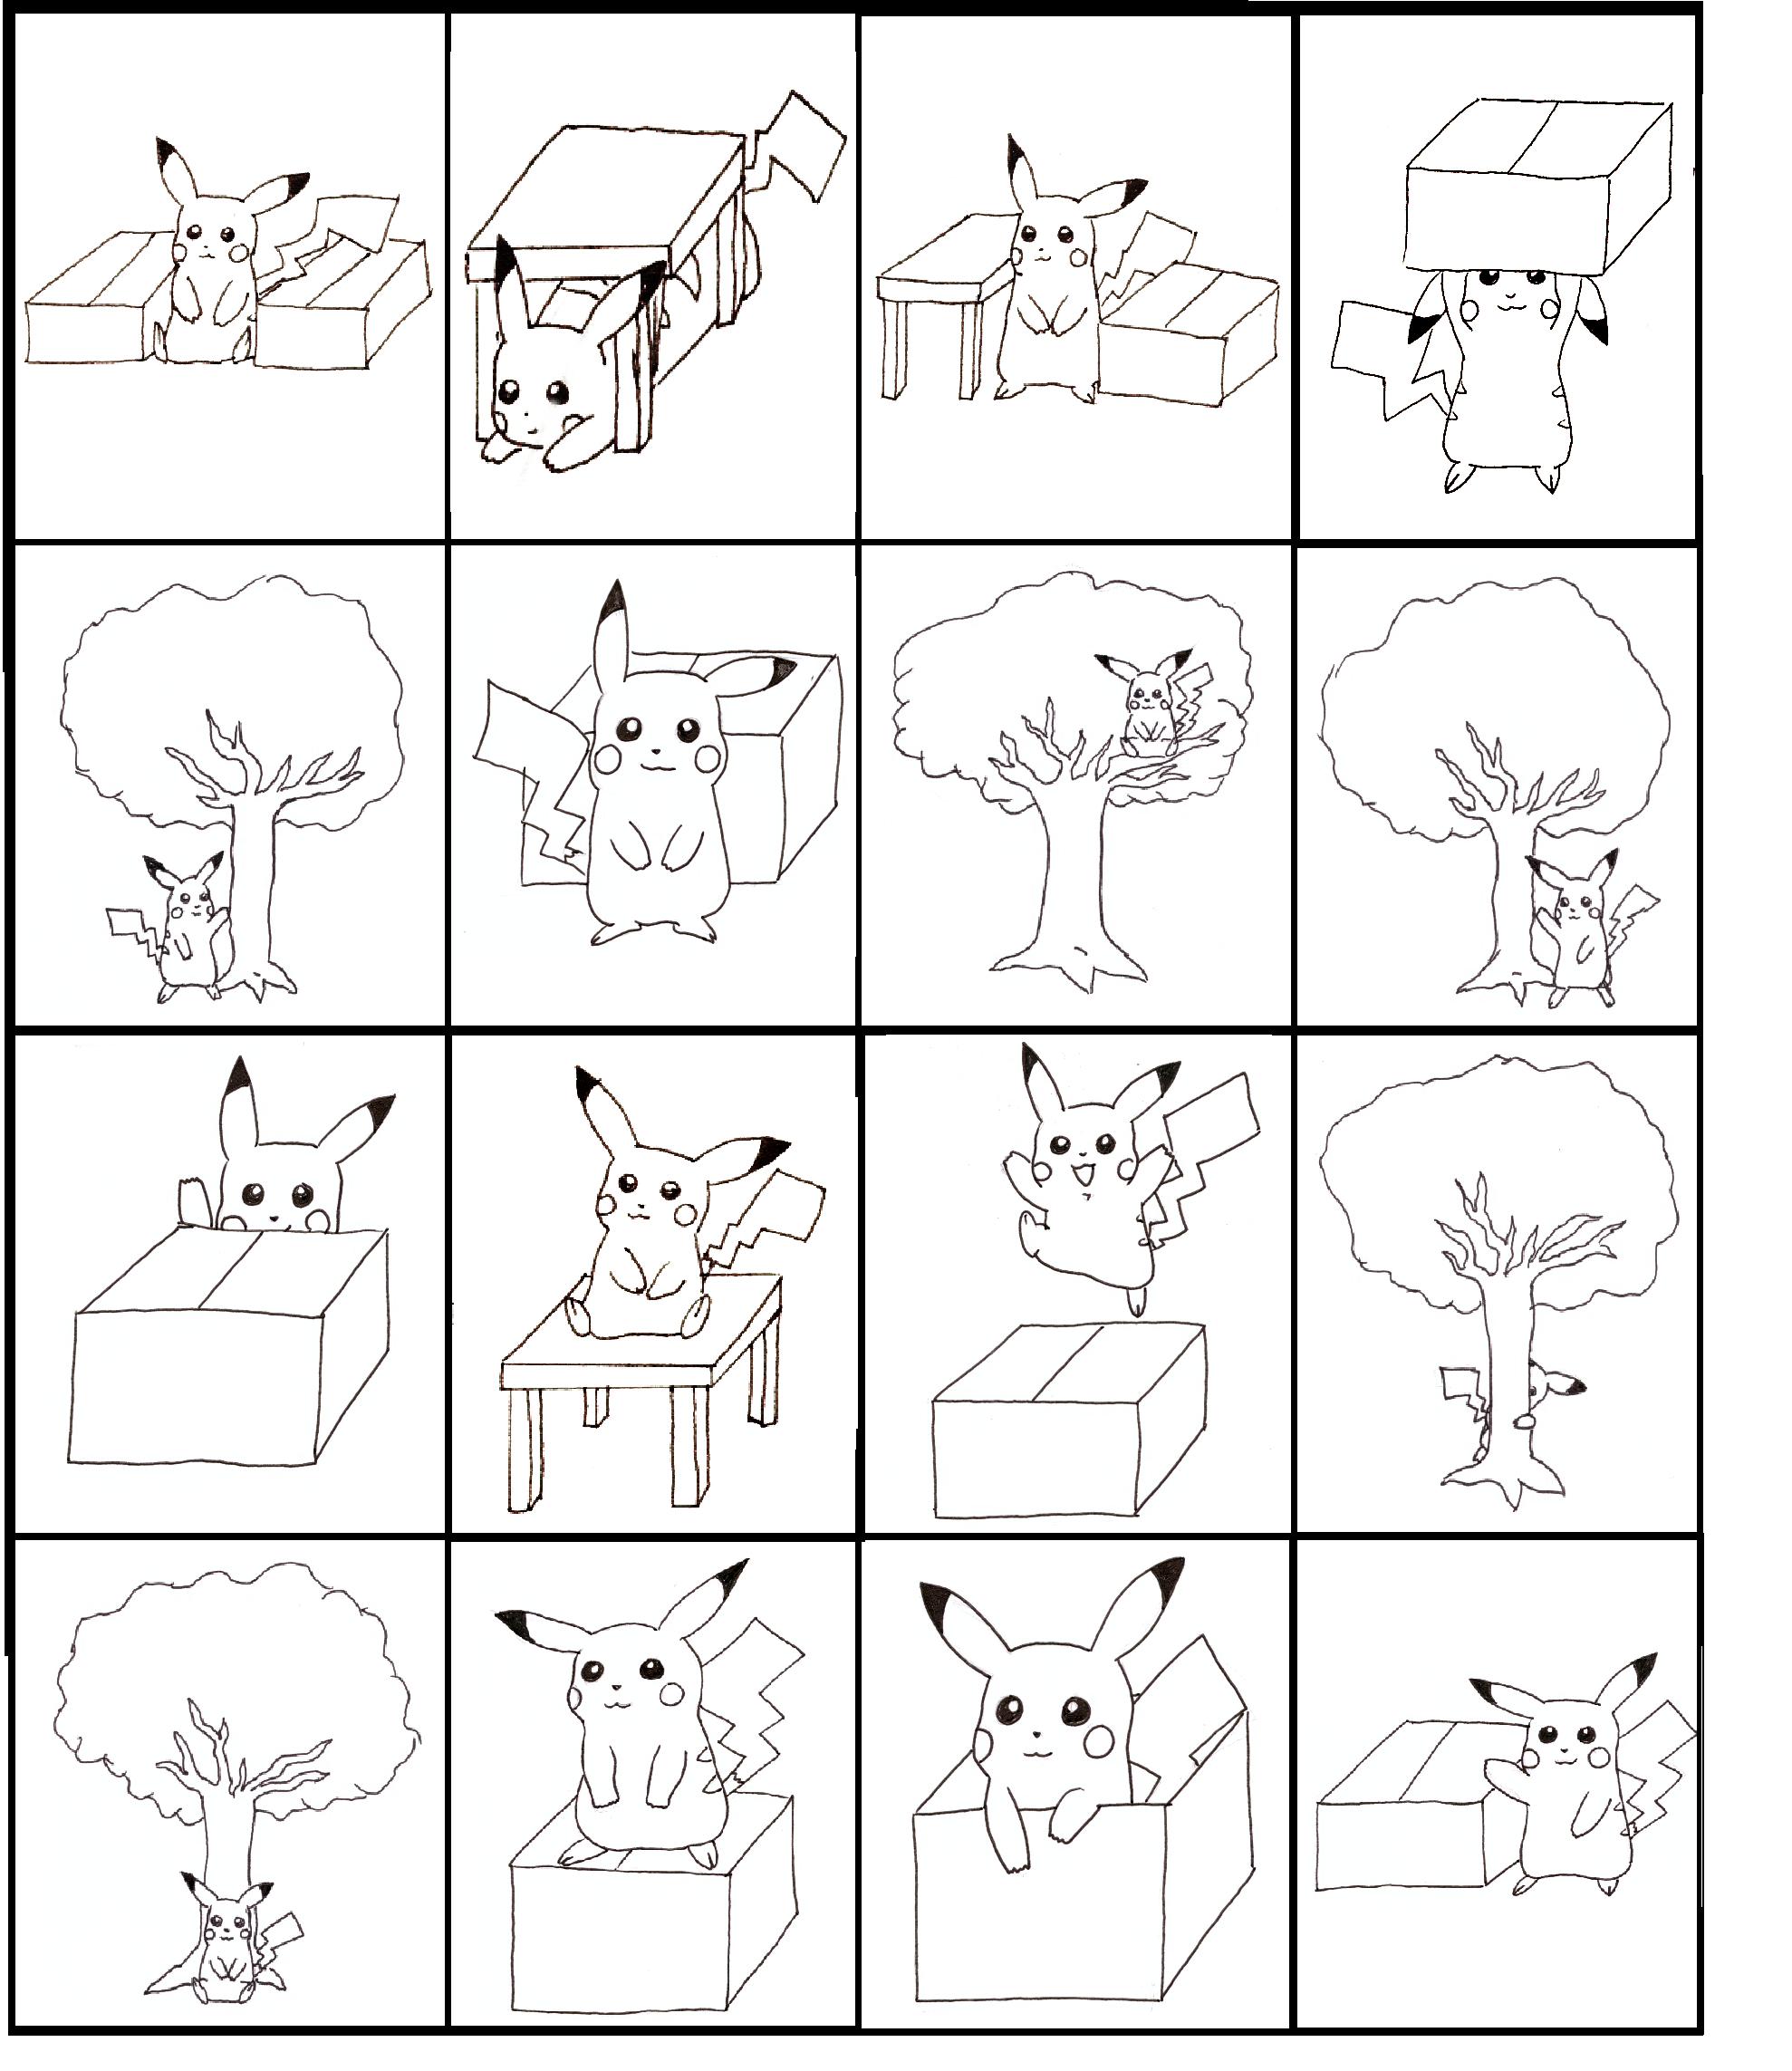 Pikachu Bingo Practicing Prepositions Board 3 Of 4 Made